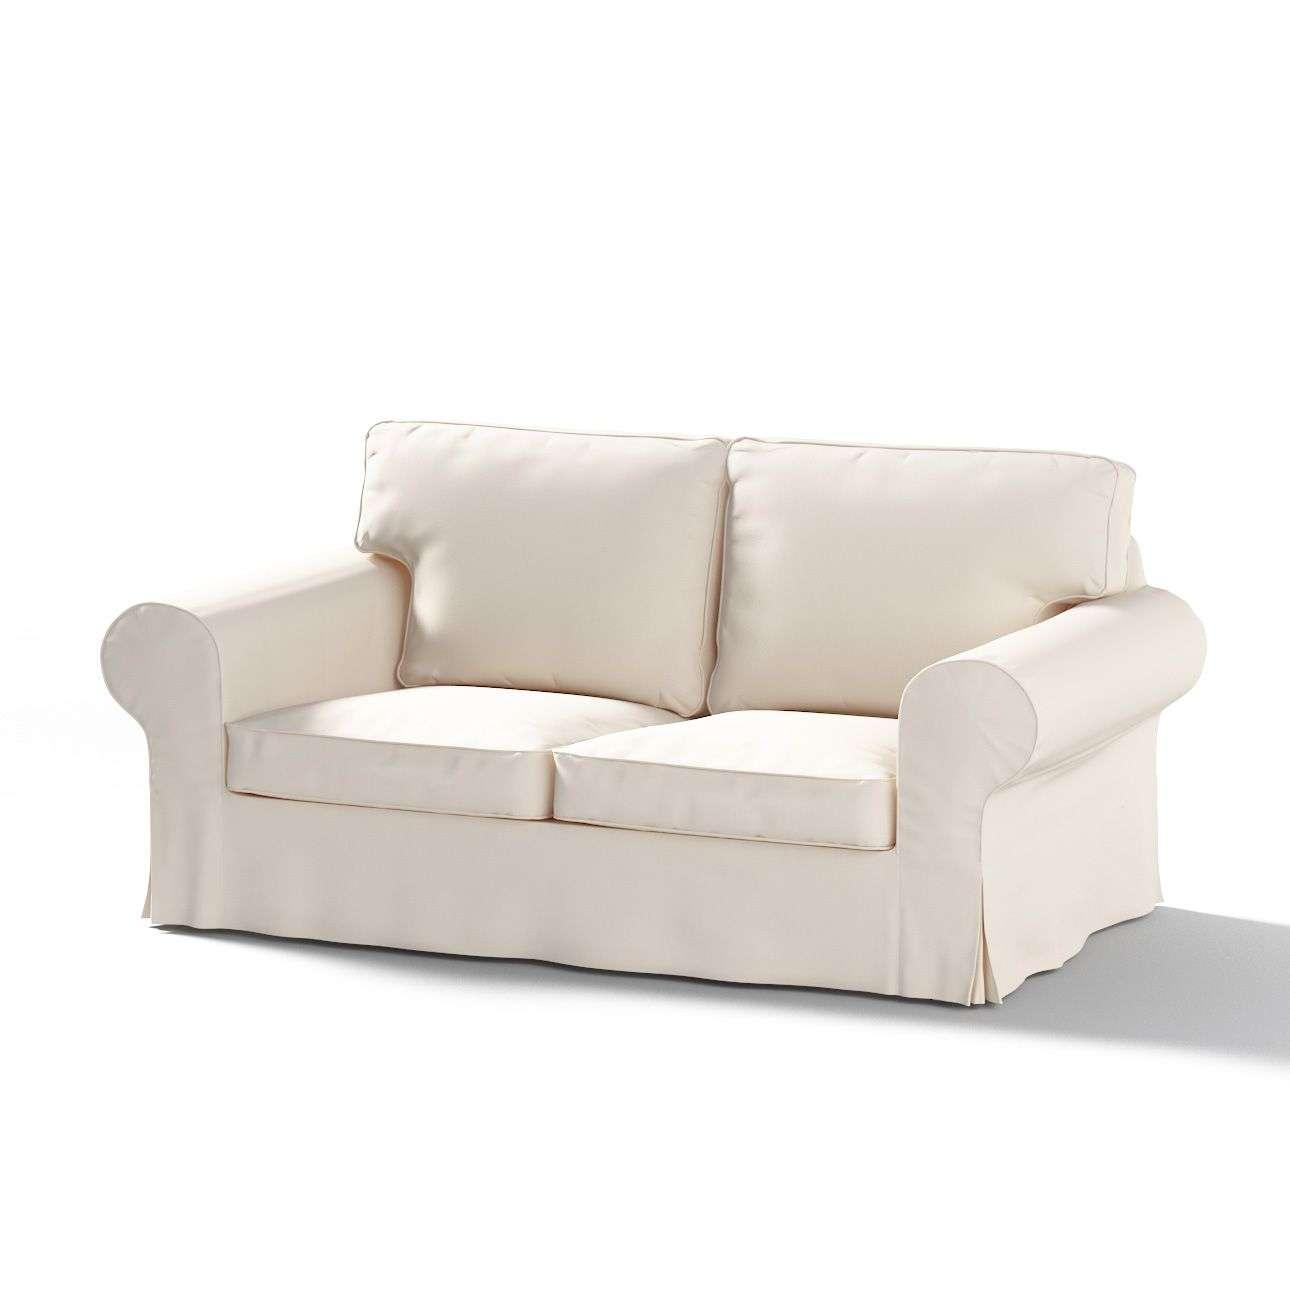 sofa bezug interesting fr ikea beddinge sofa bezug kissen with sofa bezug sofabezug in braun. Black Bedroom Furniture Sets. Home Design Ideas